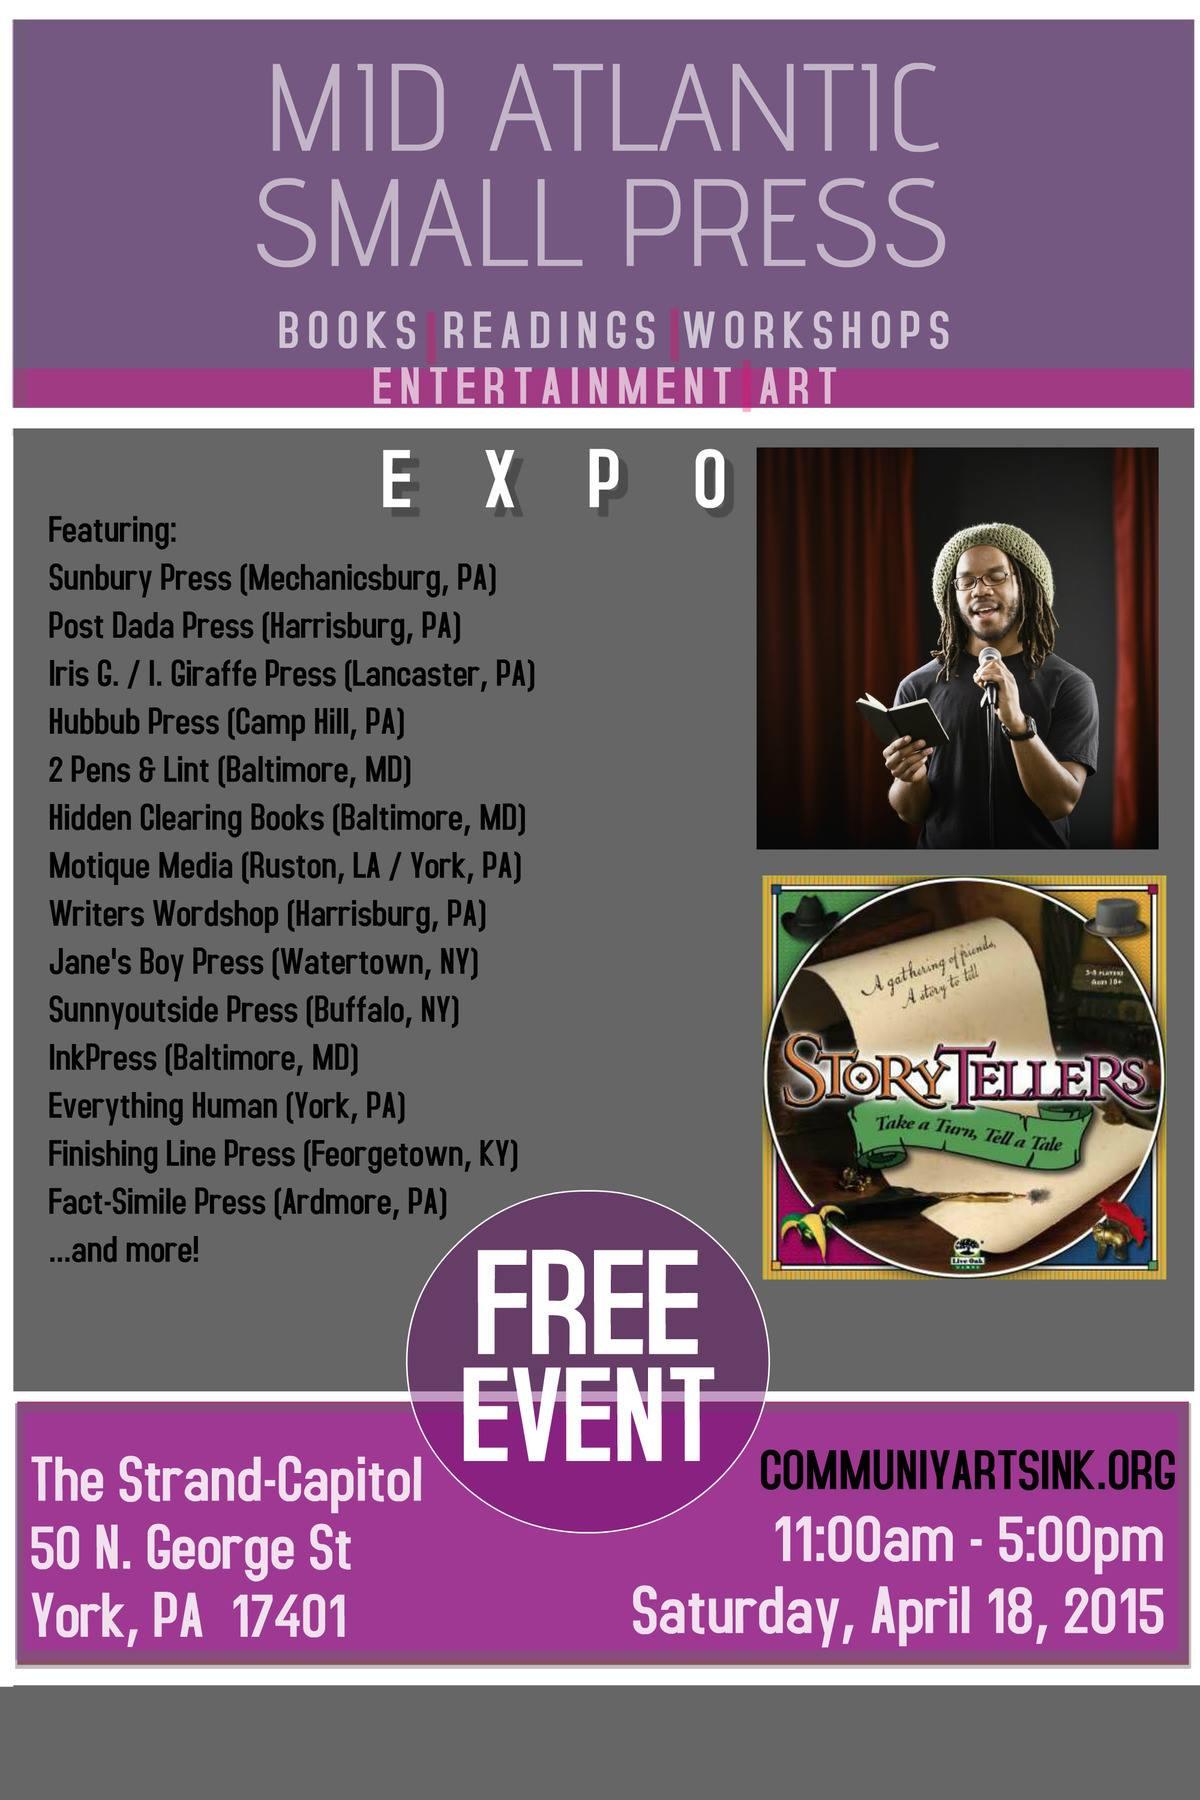 Saturday April 18th Mid Atlantic Region Small Press Expo